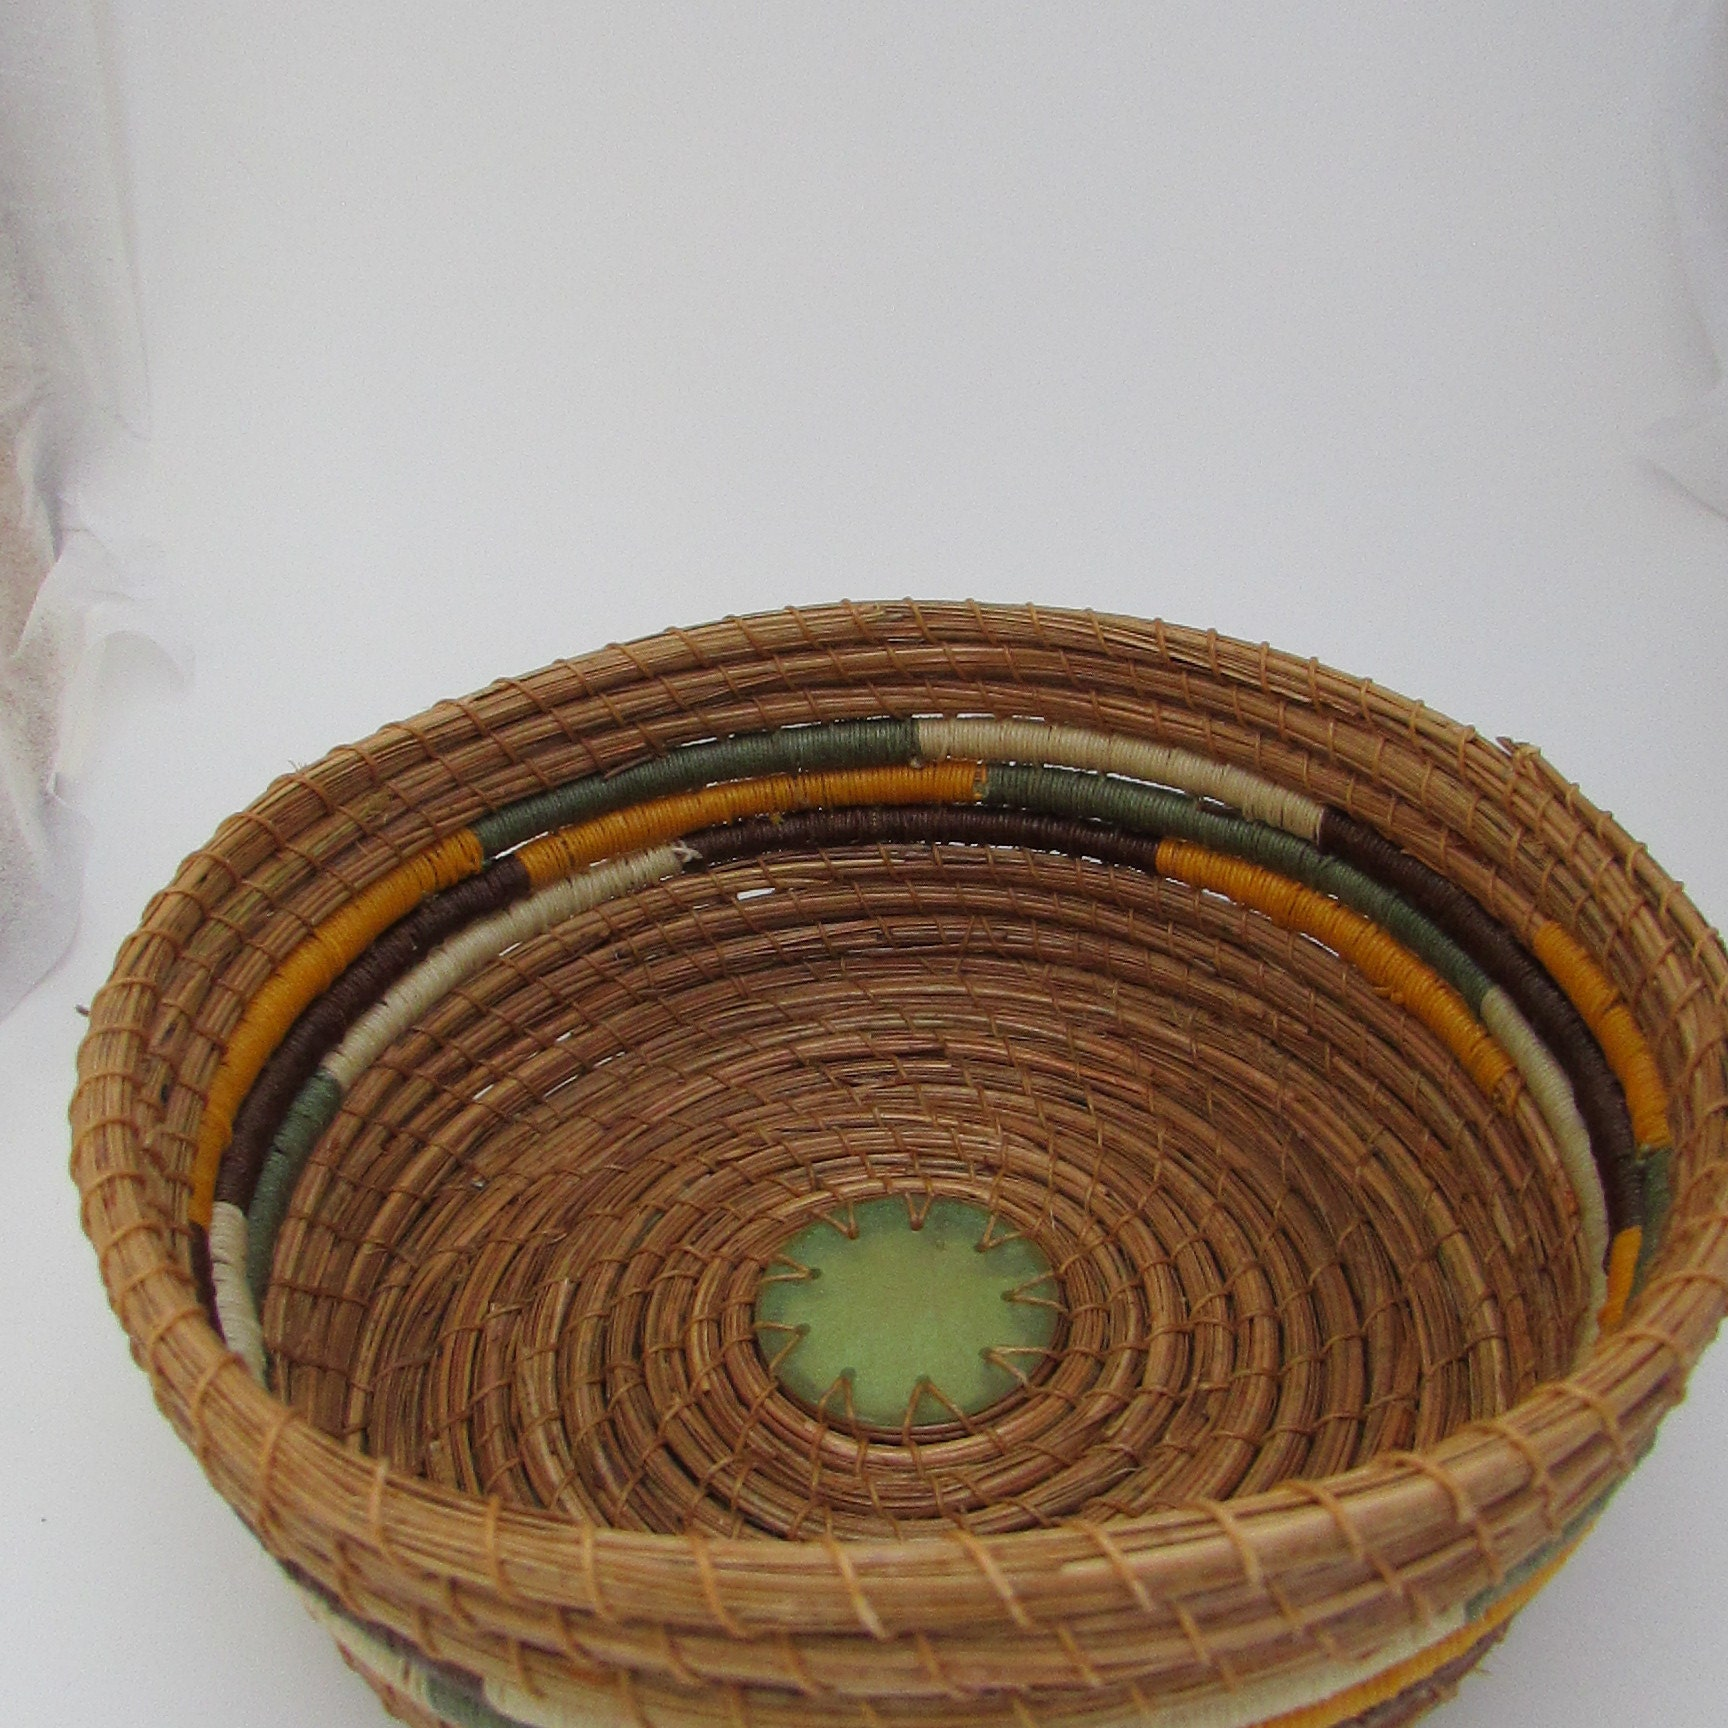 Handmade Pine Needle Baskets : Handmade pine needle baskets by kandapineneedlebskt on etsy